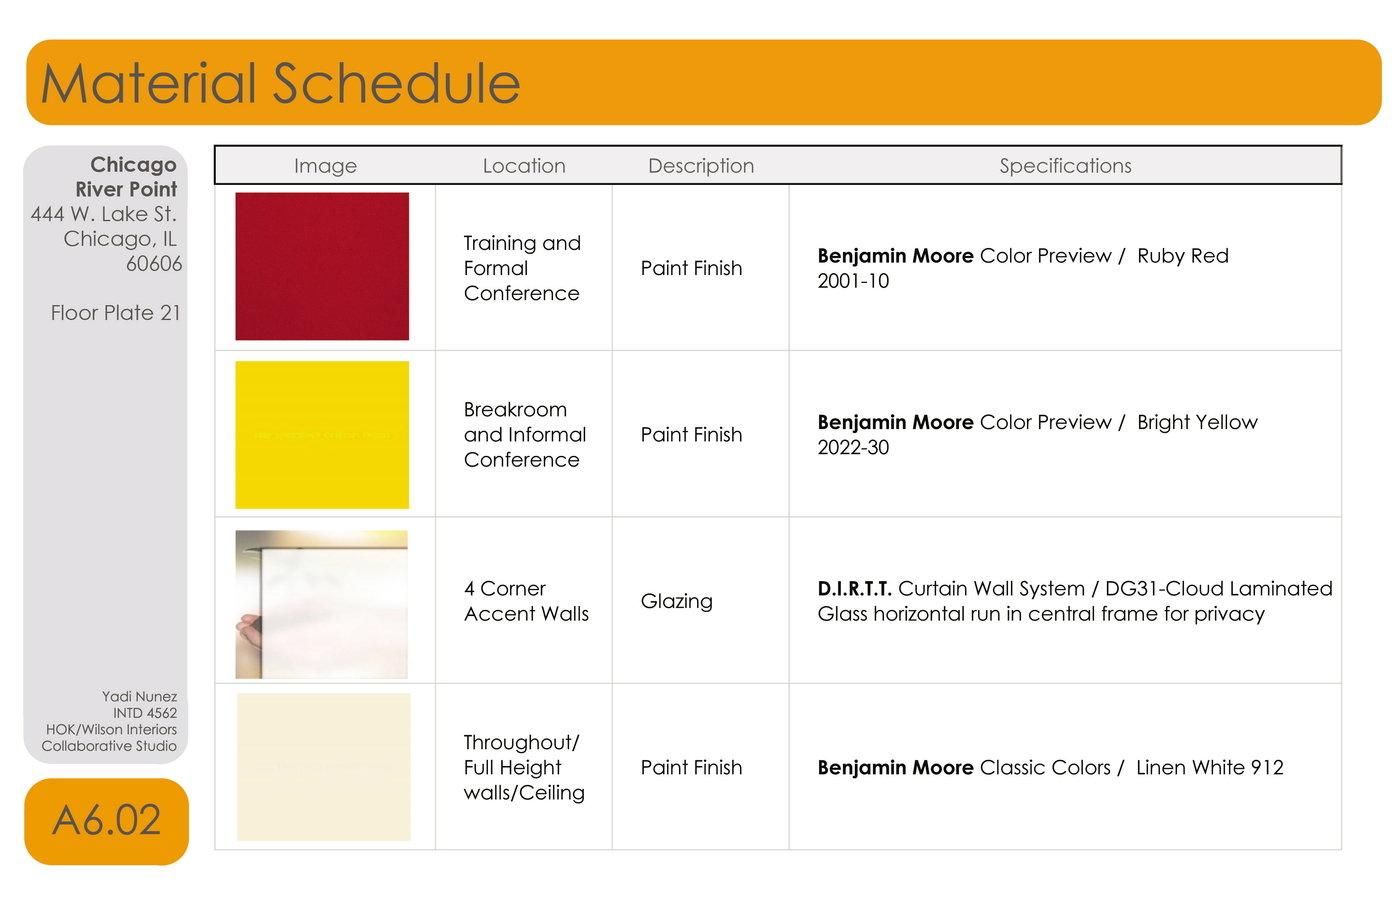 Hok collaborative senior project by yadi nunez at for Interior design materials list